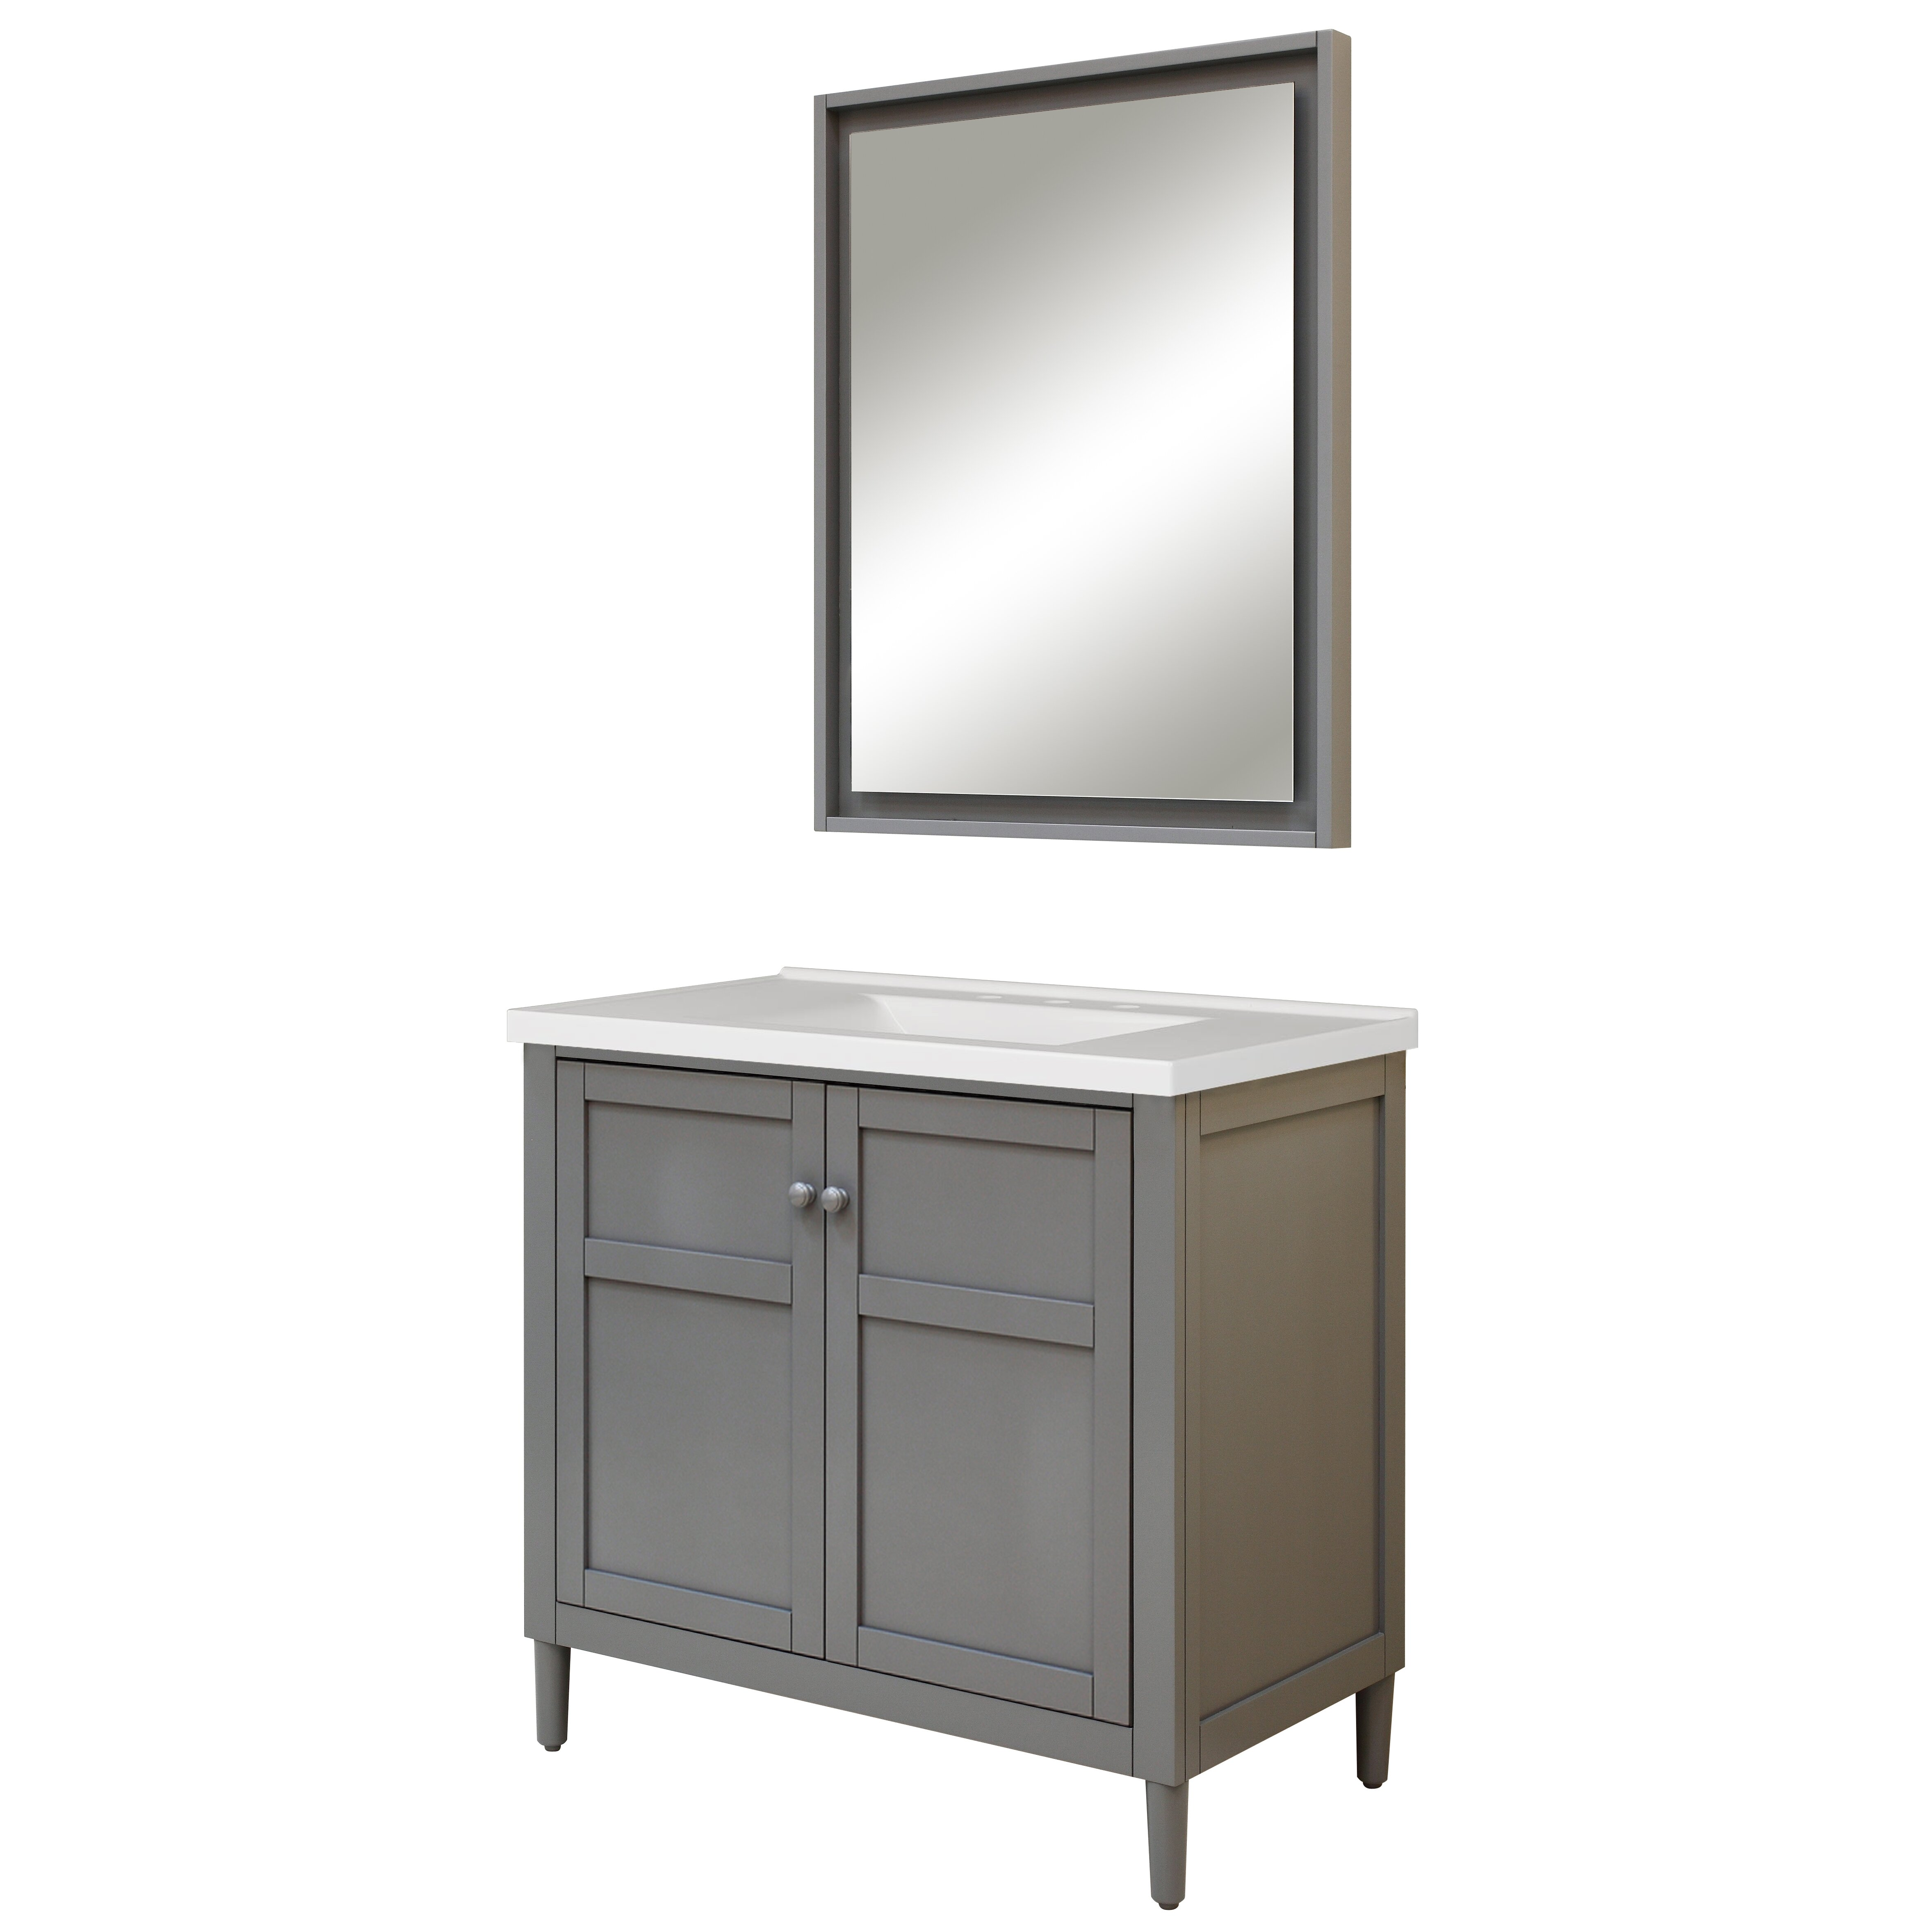 Sagehill Harper 37 Single Bathroom Vanity Set With